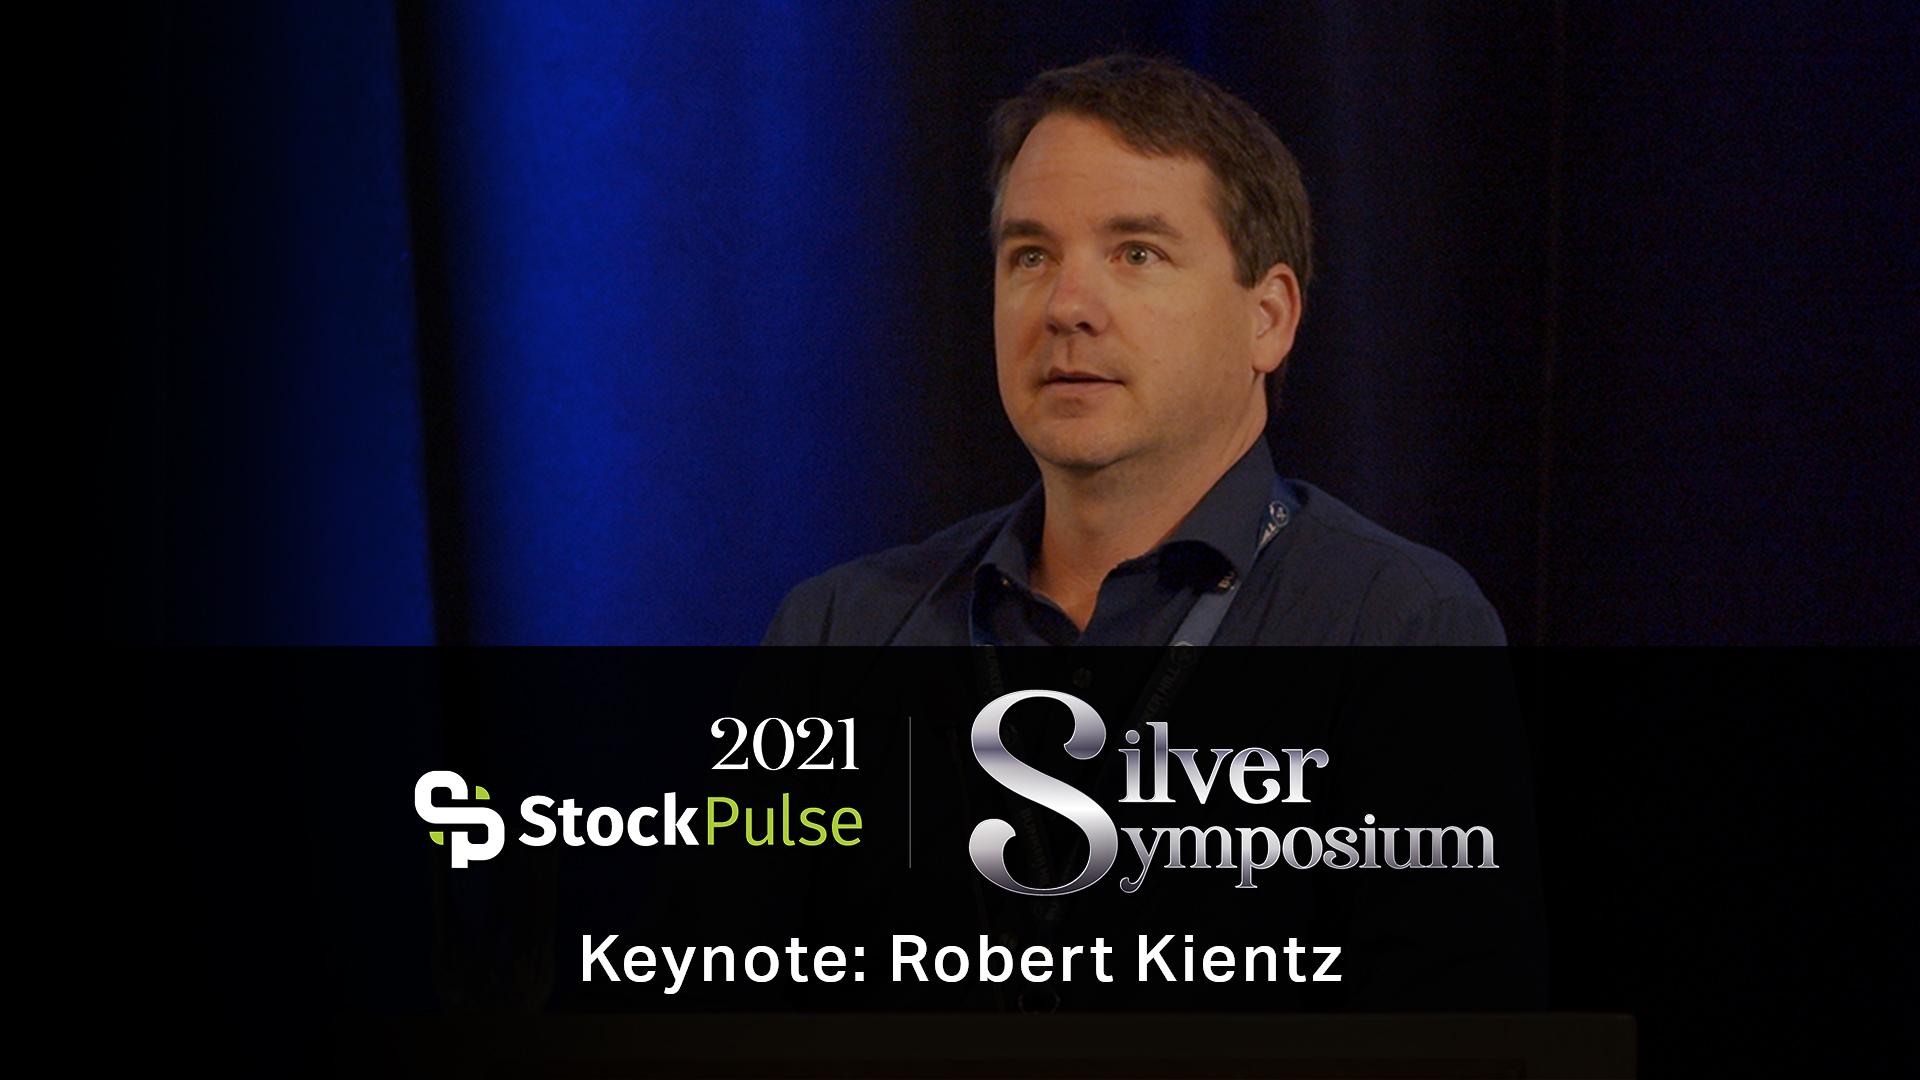 Keynote Robert Kientz: Texas Is Becoming A Financial Powerhouse